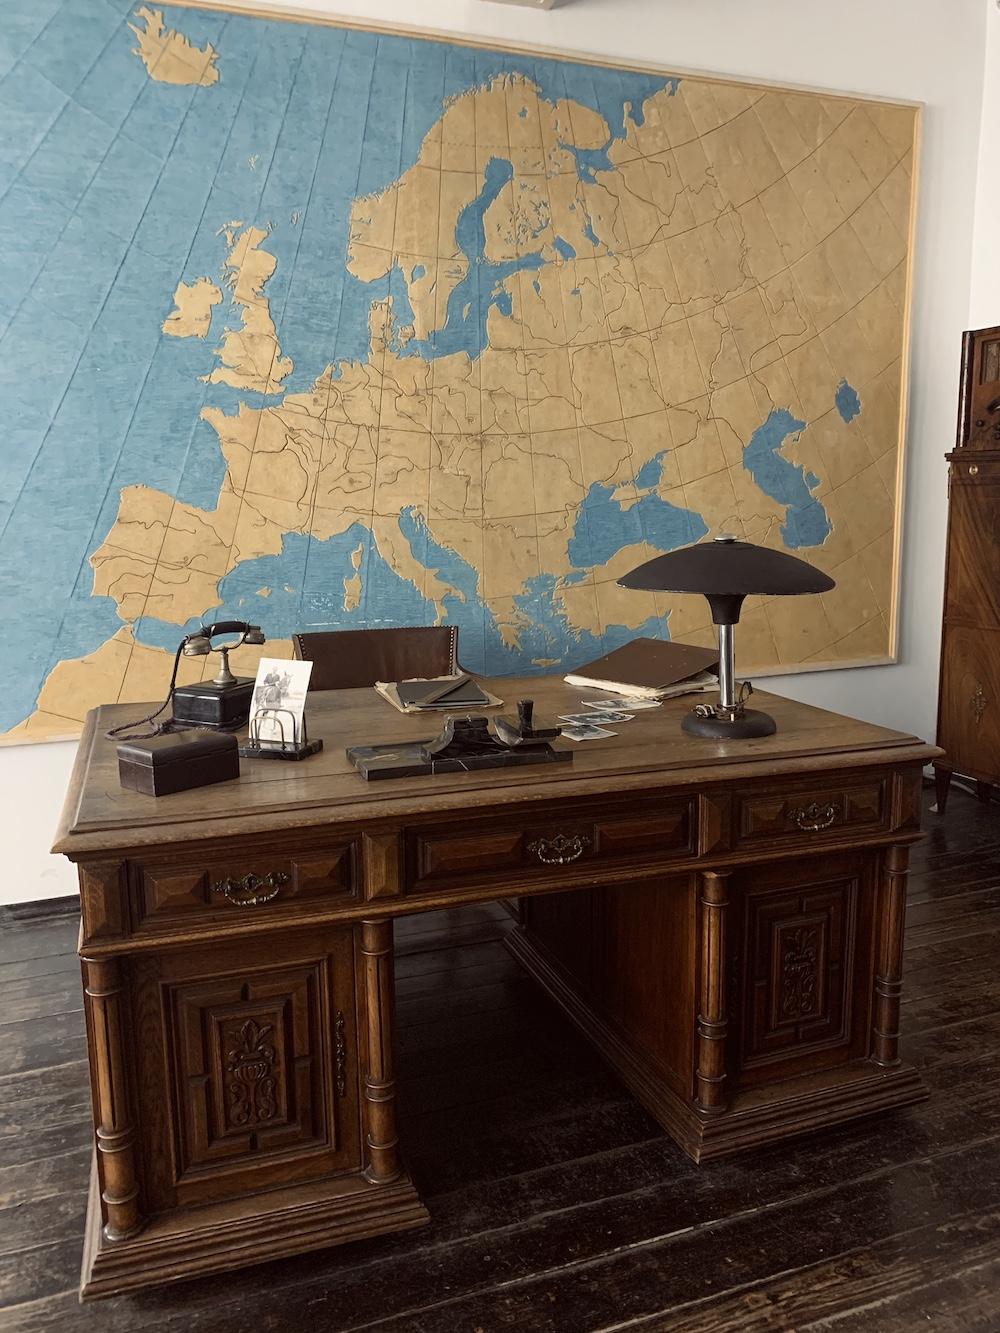 wereldkaart Fabriek van Oskar Schindler krakau